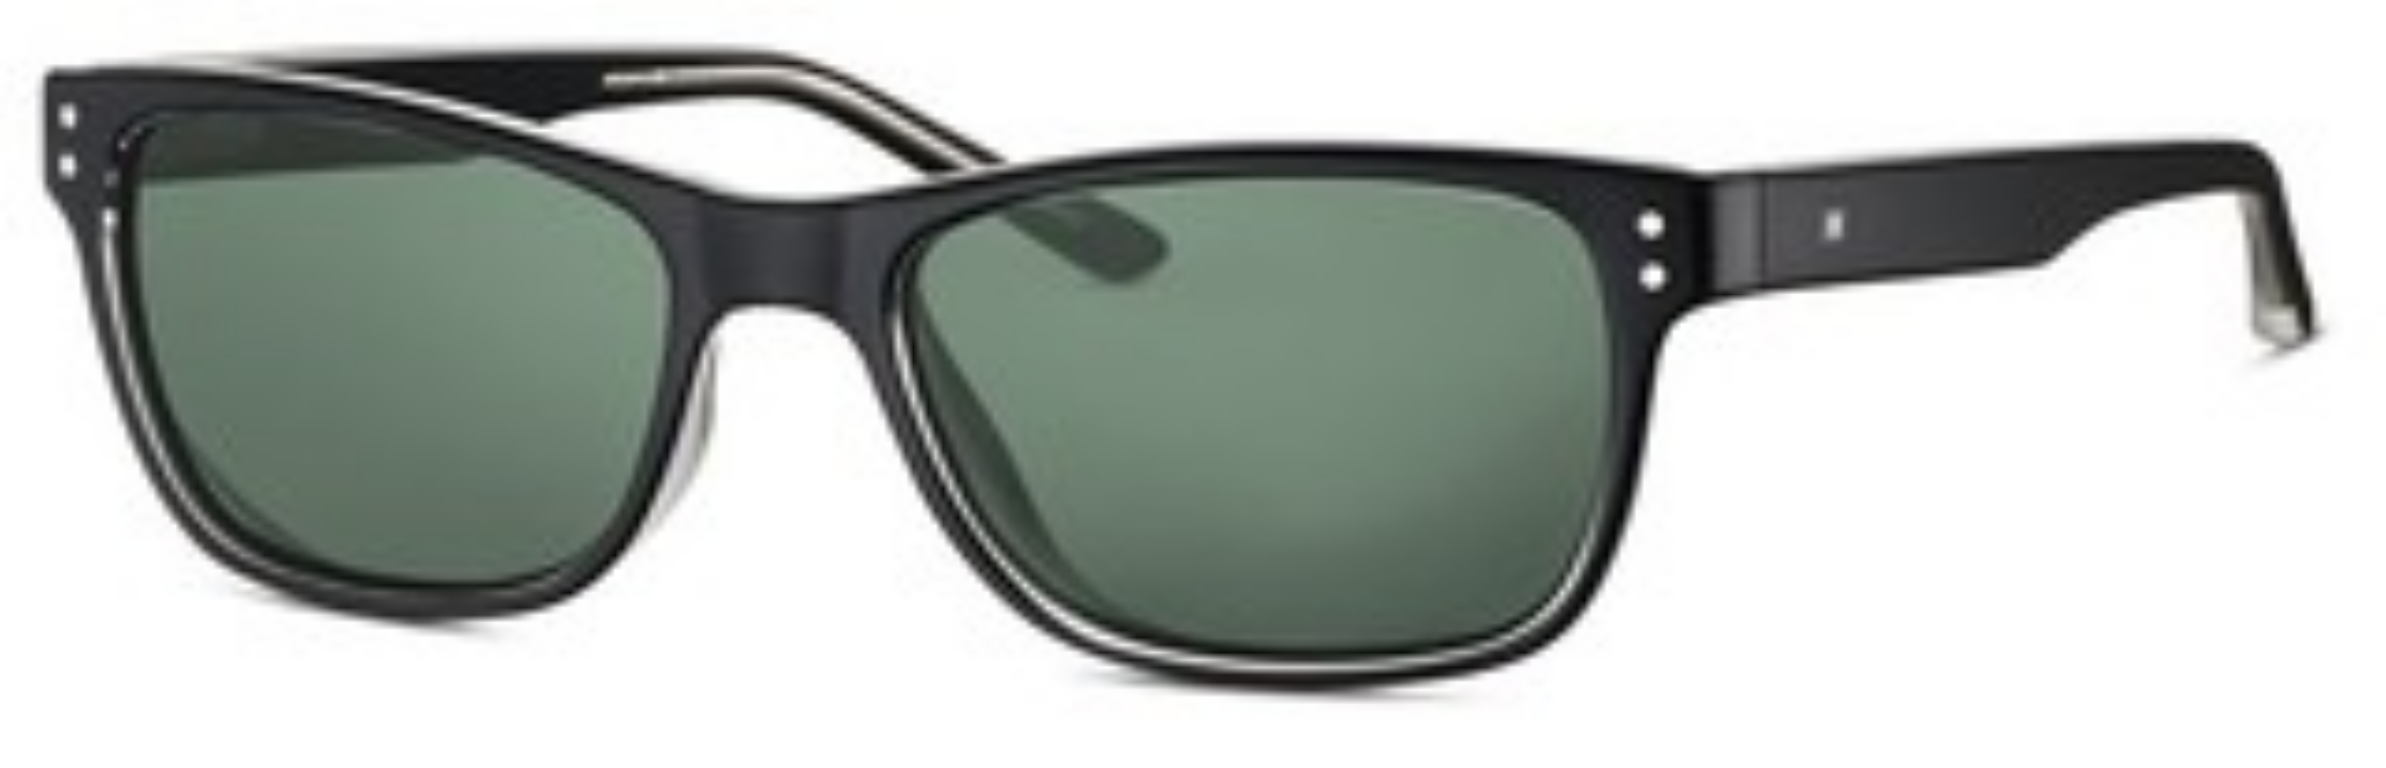 Humphrey's Kindersonnenbrille 585137-Schwarz-Kristall J2vCS5PVrs